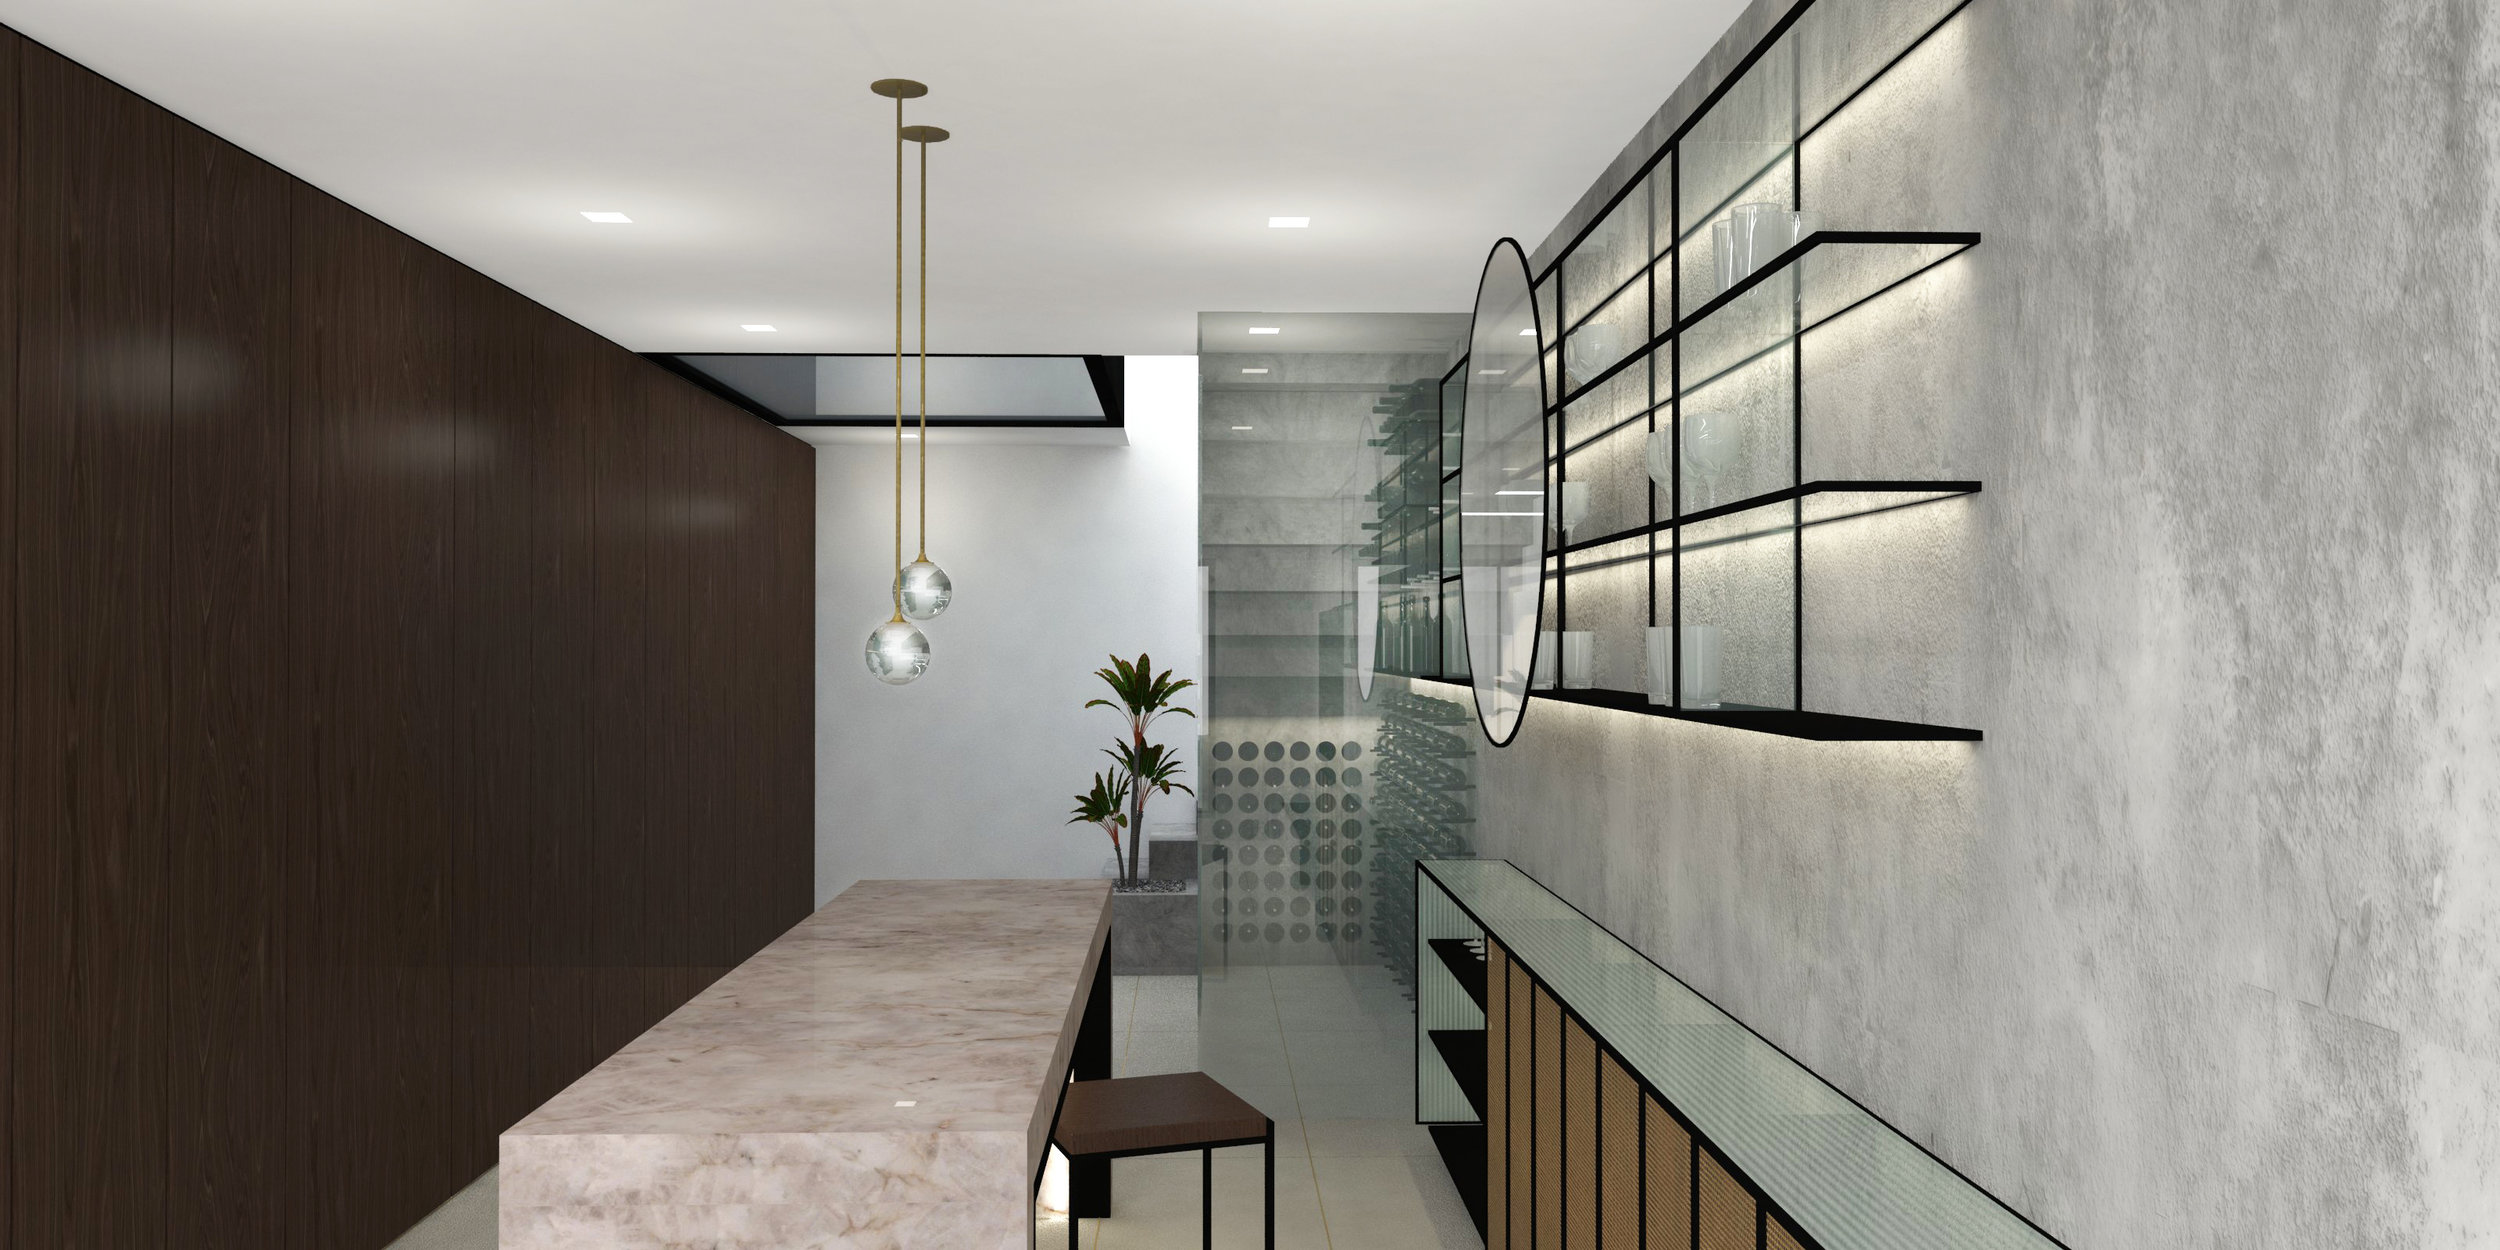 Woodhaven 20180730 Cellar 001.jpg